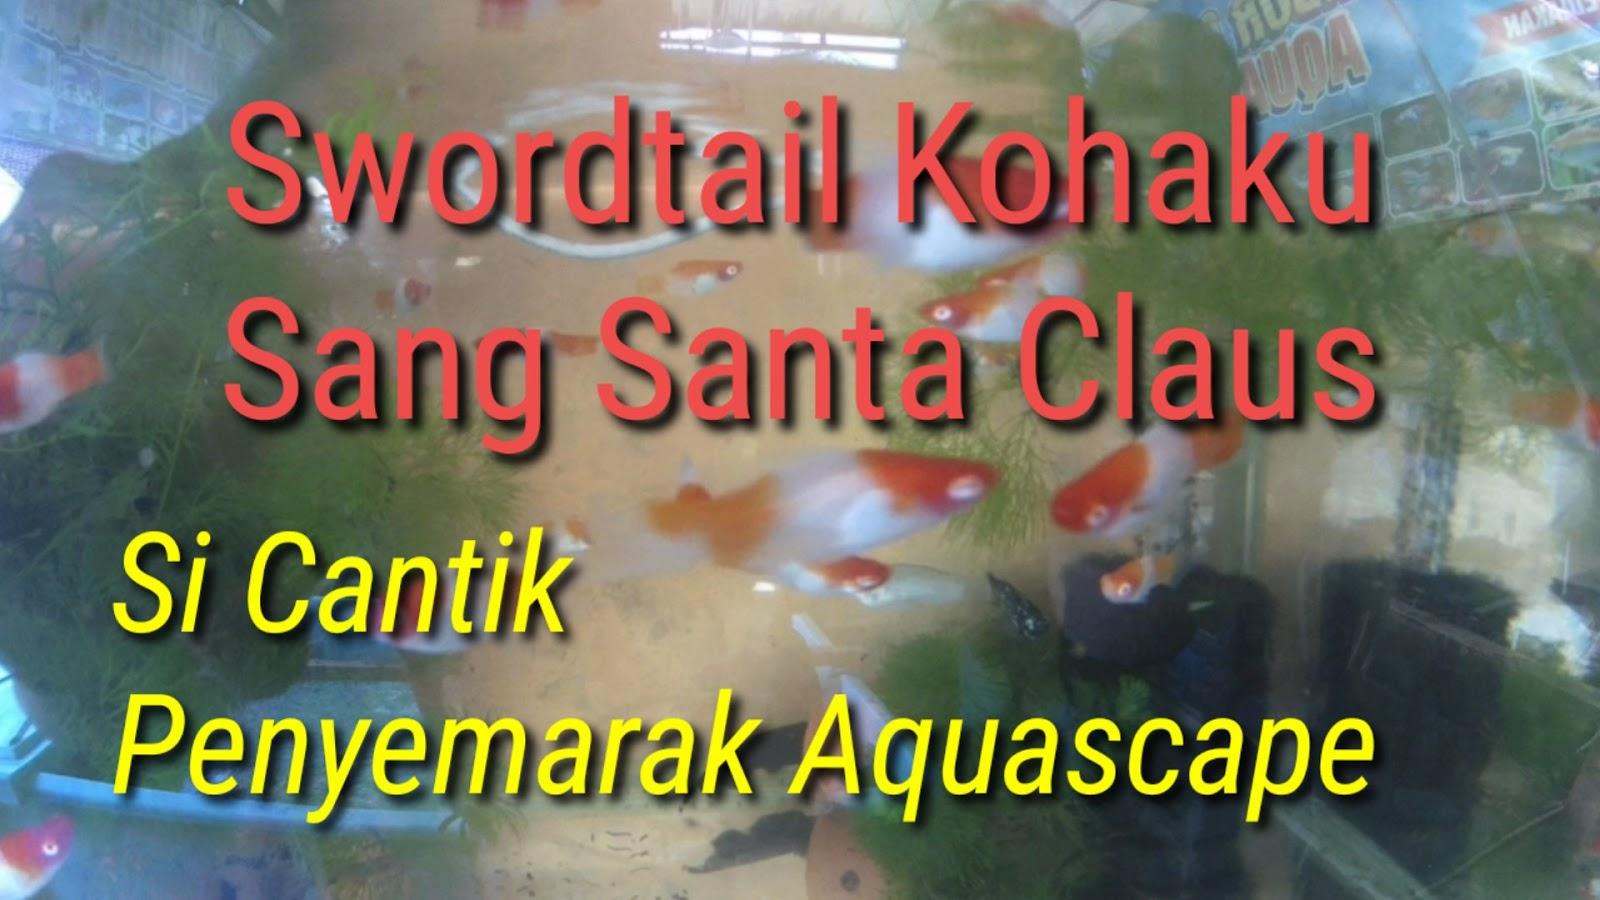 Swordtail Kohaku Sang Santa Claus, Si Cantik Penyemarak Aquascape